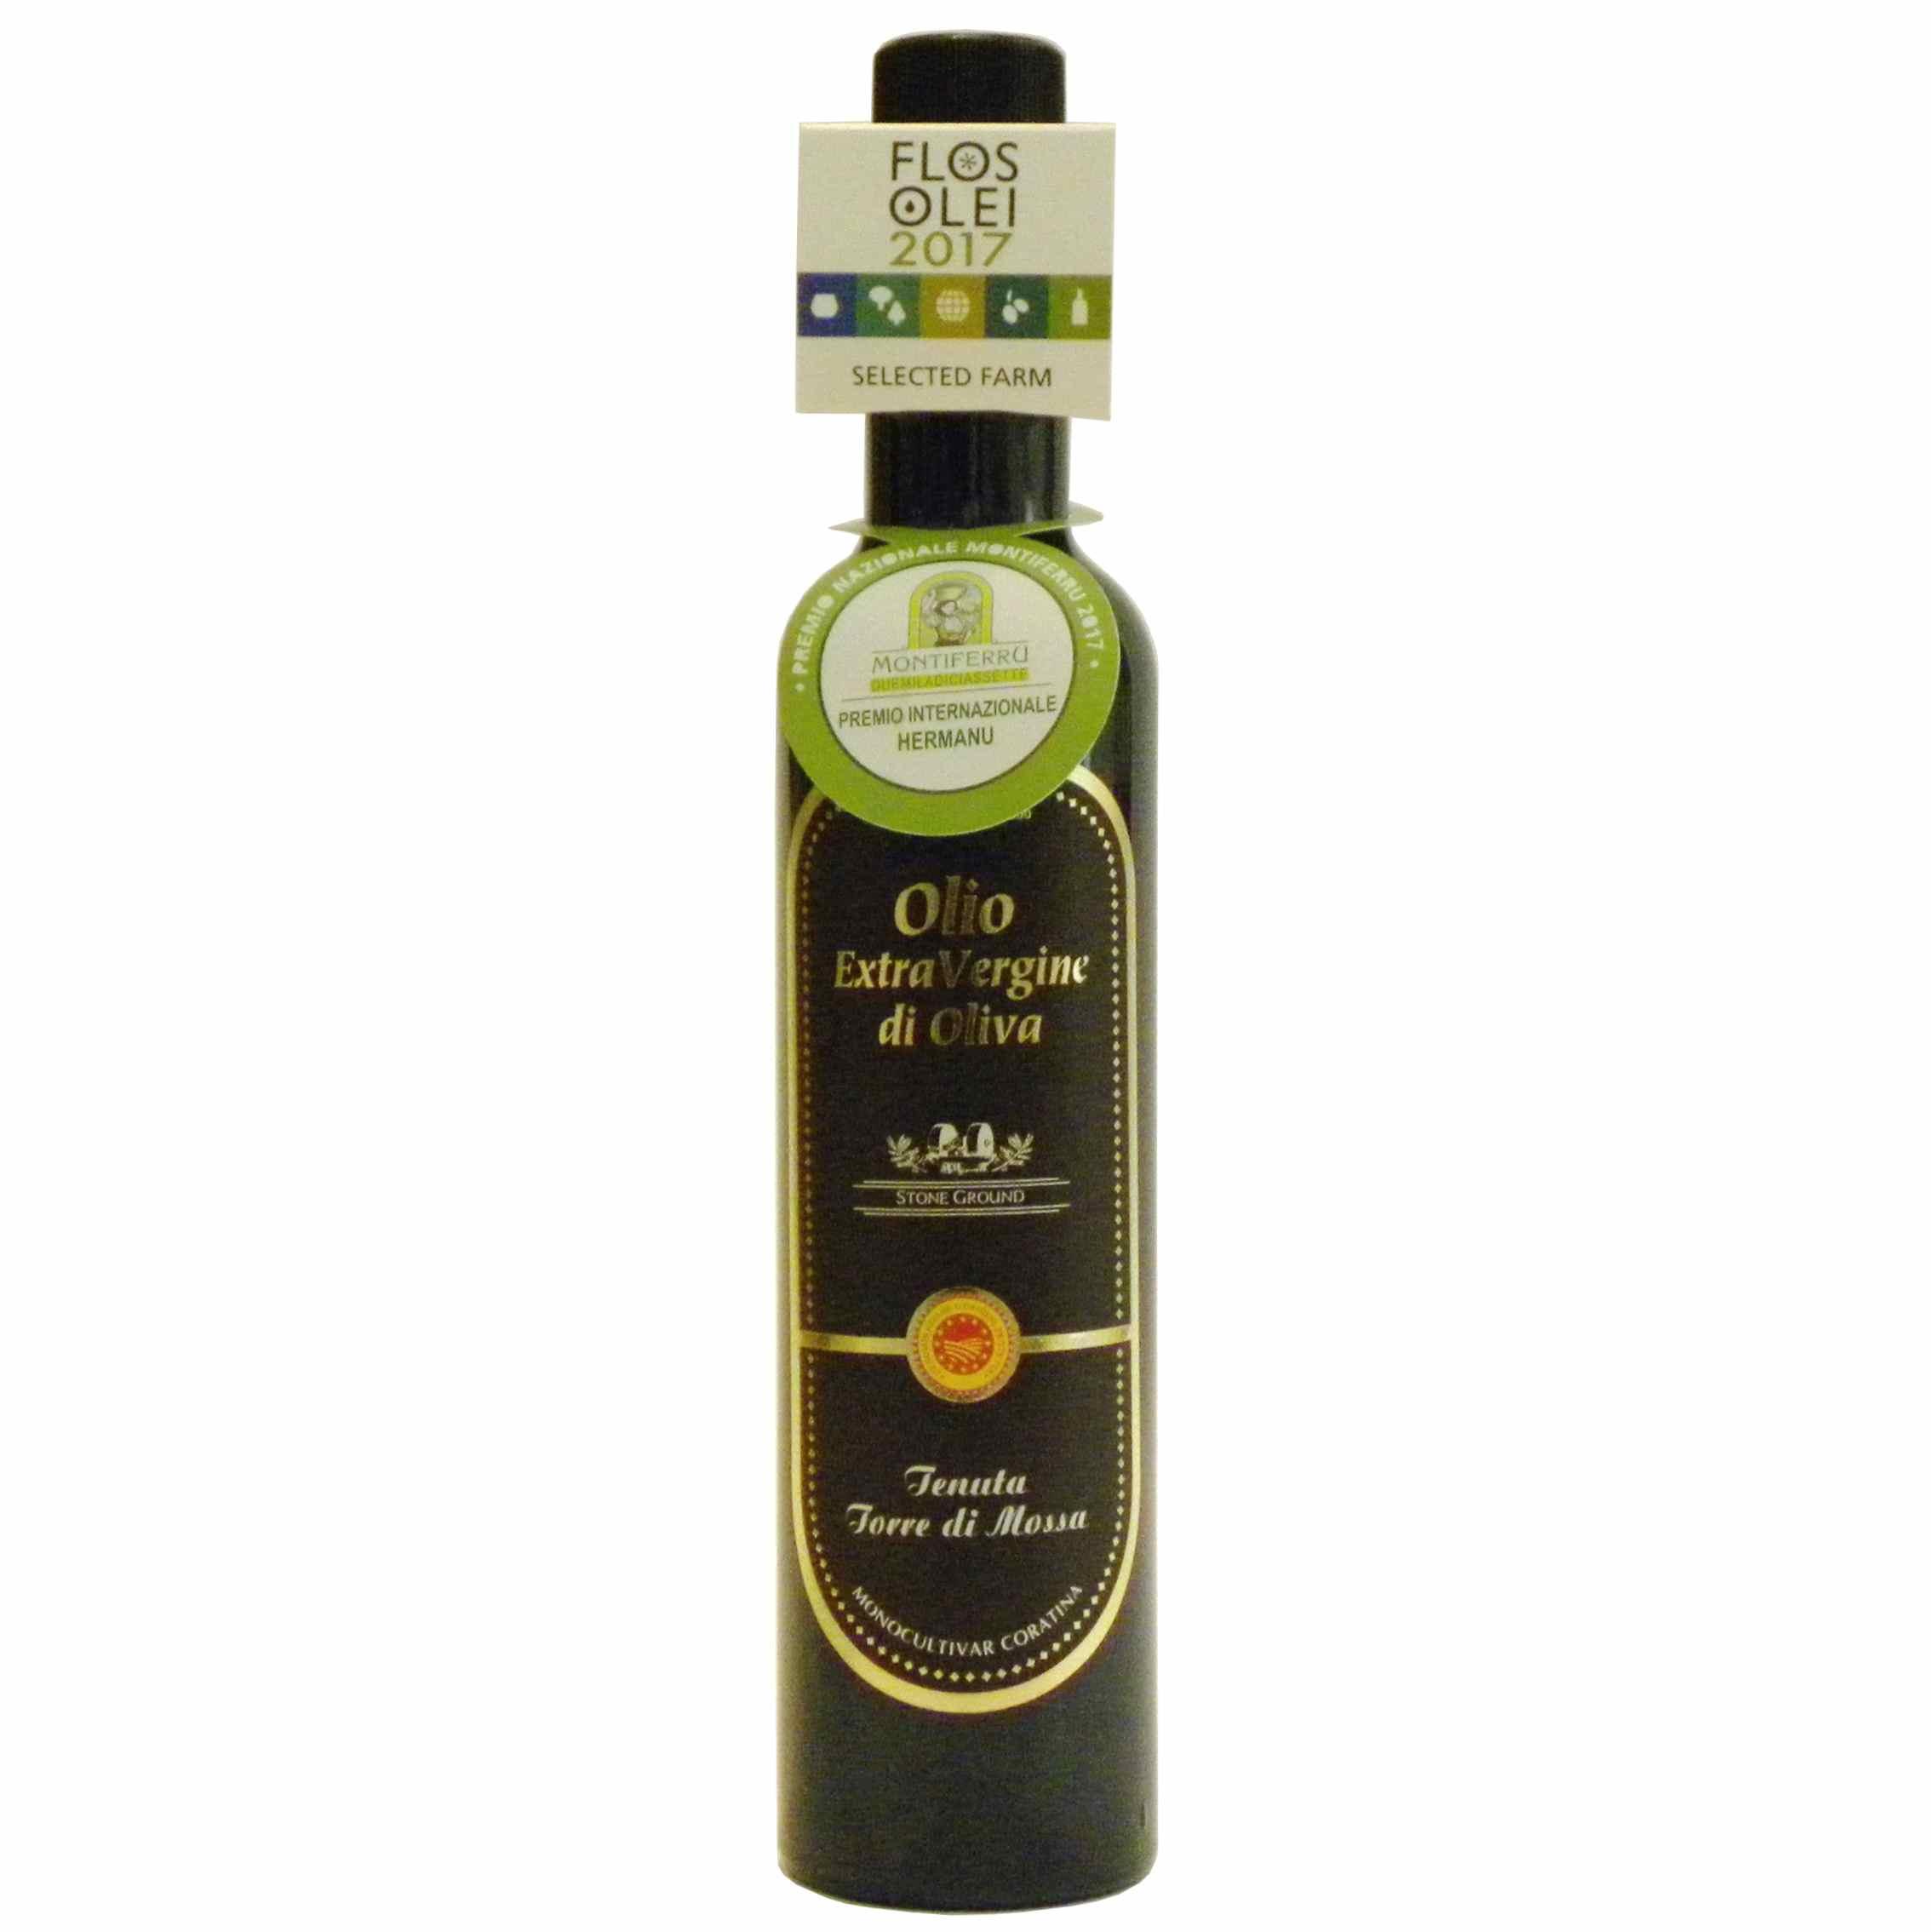 De Carlo Olio extravergine di oliva Torre di Mossa – De Carlo Extra virgin olive oil Torre di Mossa – Gustorotondo – Italian food boutique